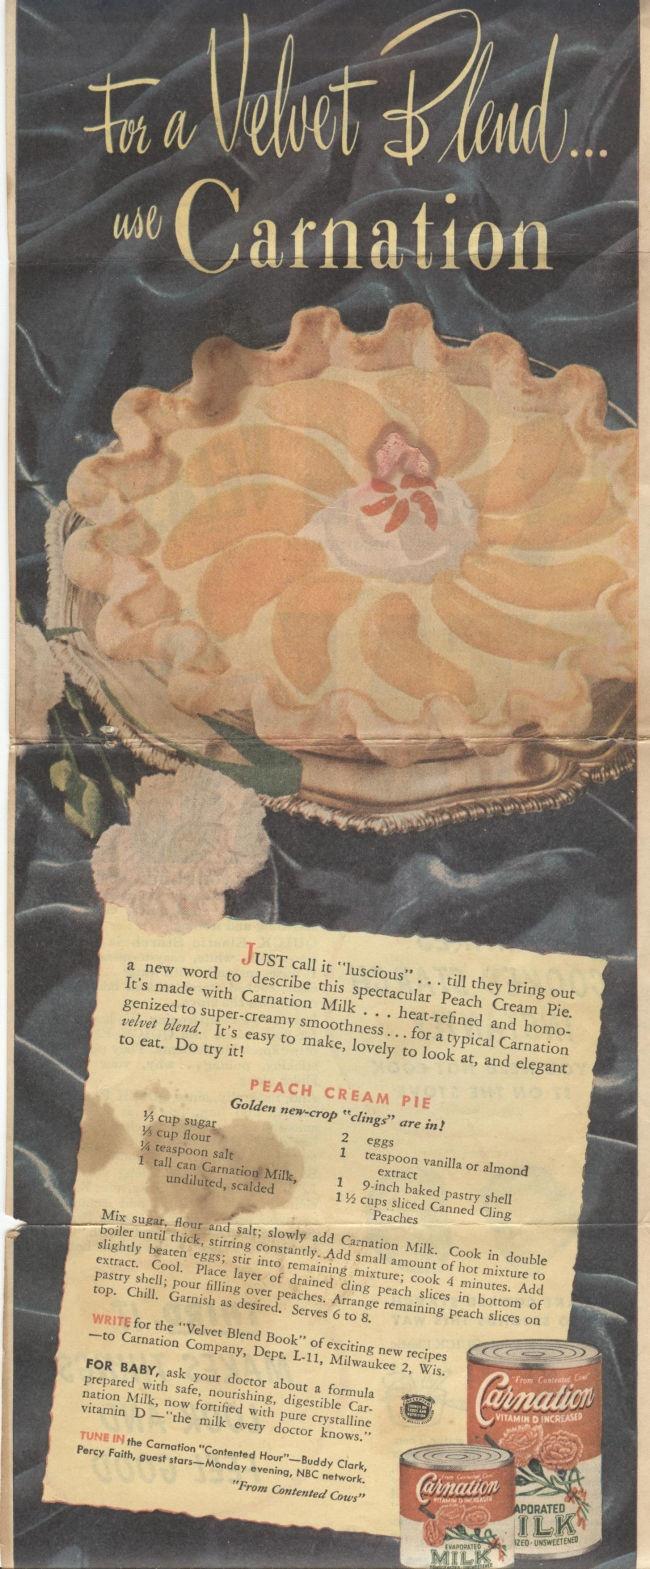 Jamie Oliver's Sweet Pea Fish Pie recipe